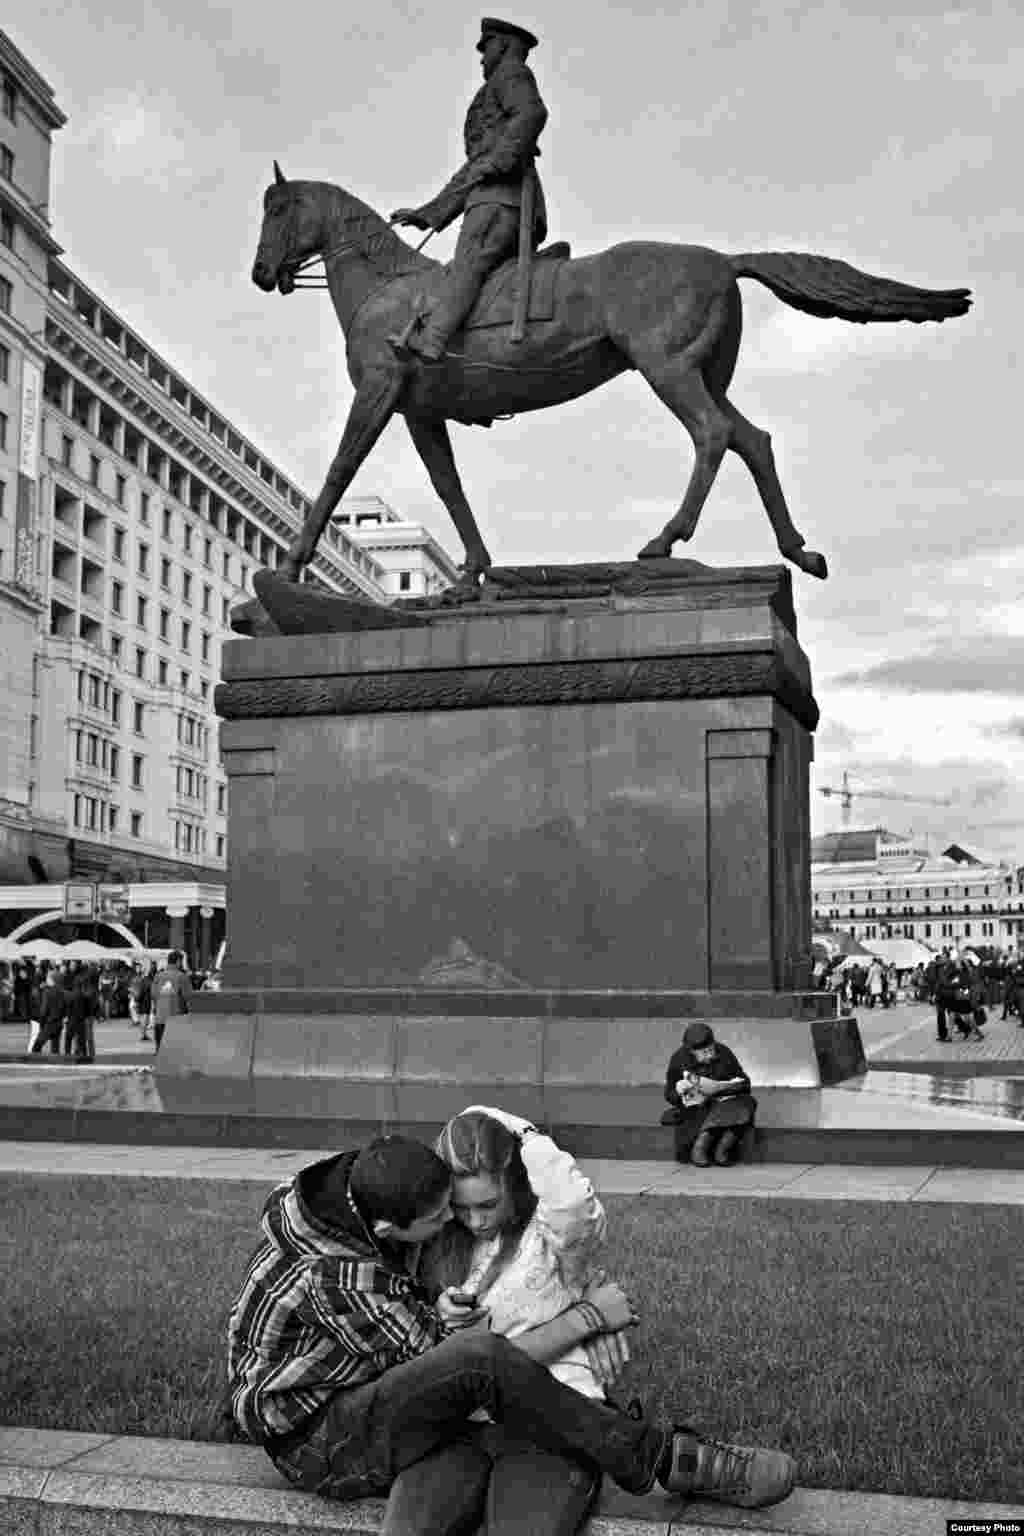 Памятник маршалу Жукову. Москва. 2012 год.